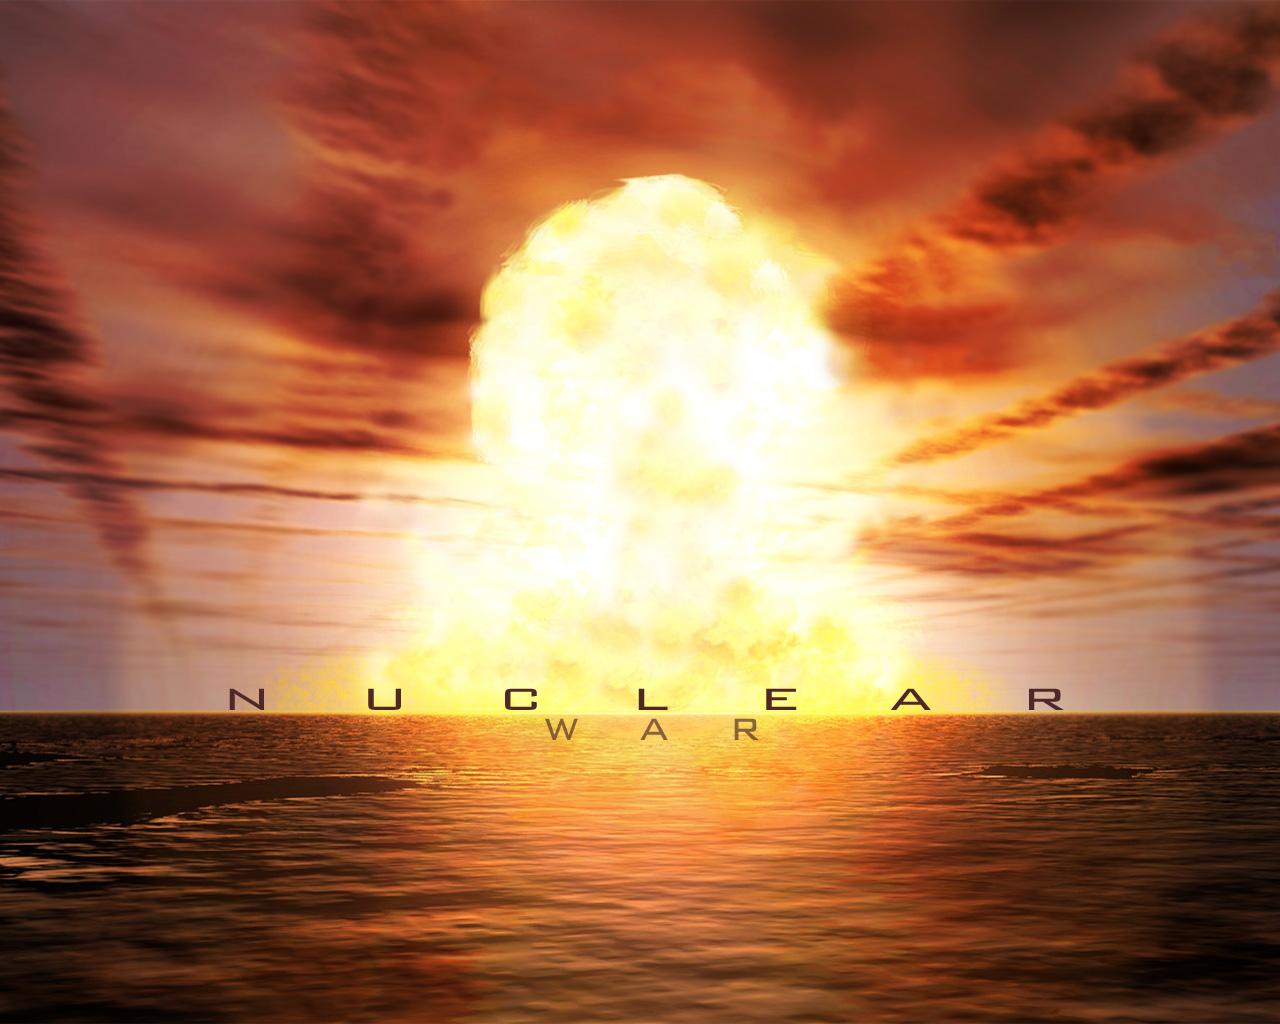 https://i1.wp.com/www.pakalertpress.com/wp-content/uploads/2010/08/Nuclear_War_008160_.jpg